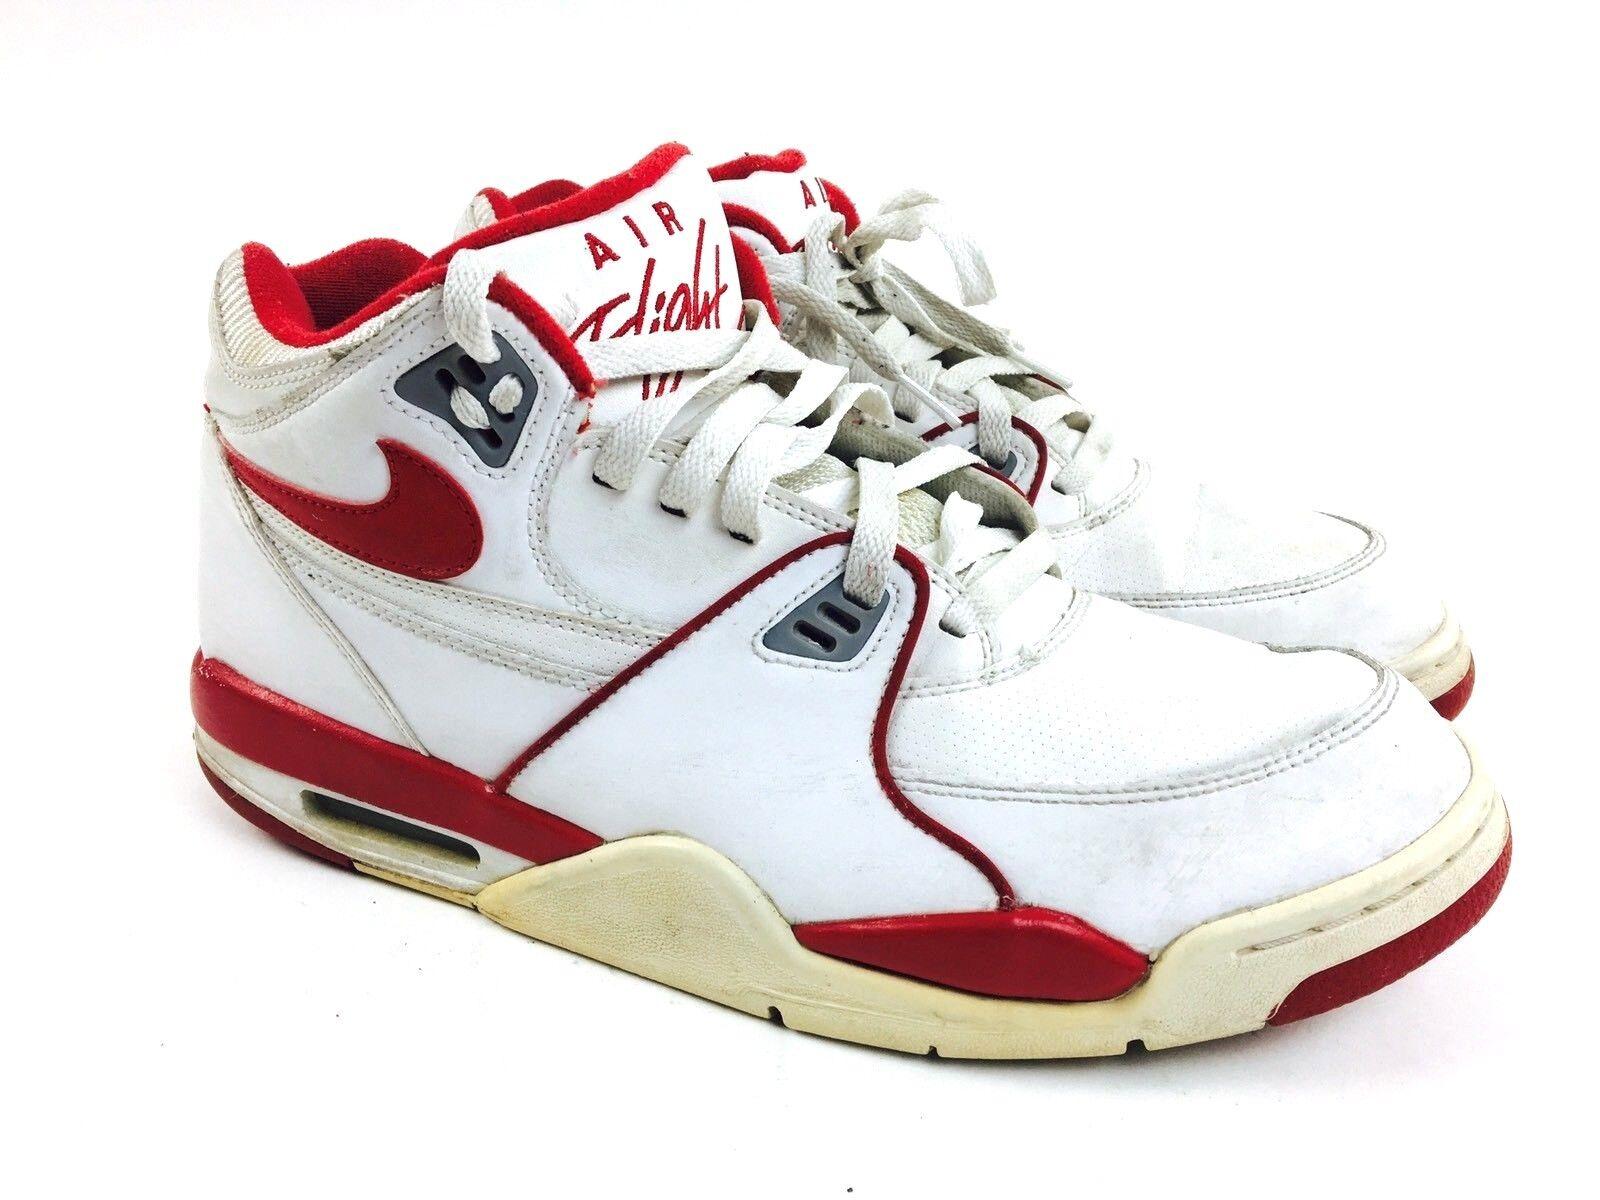 Nike Air Flight Shoes Men's Athletic Shoes White Nike Air Flight Sneakers 11